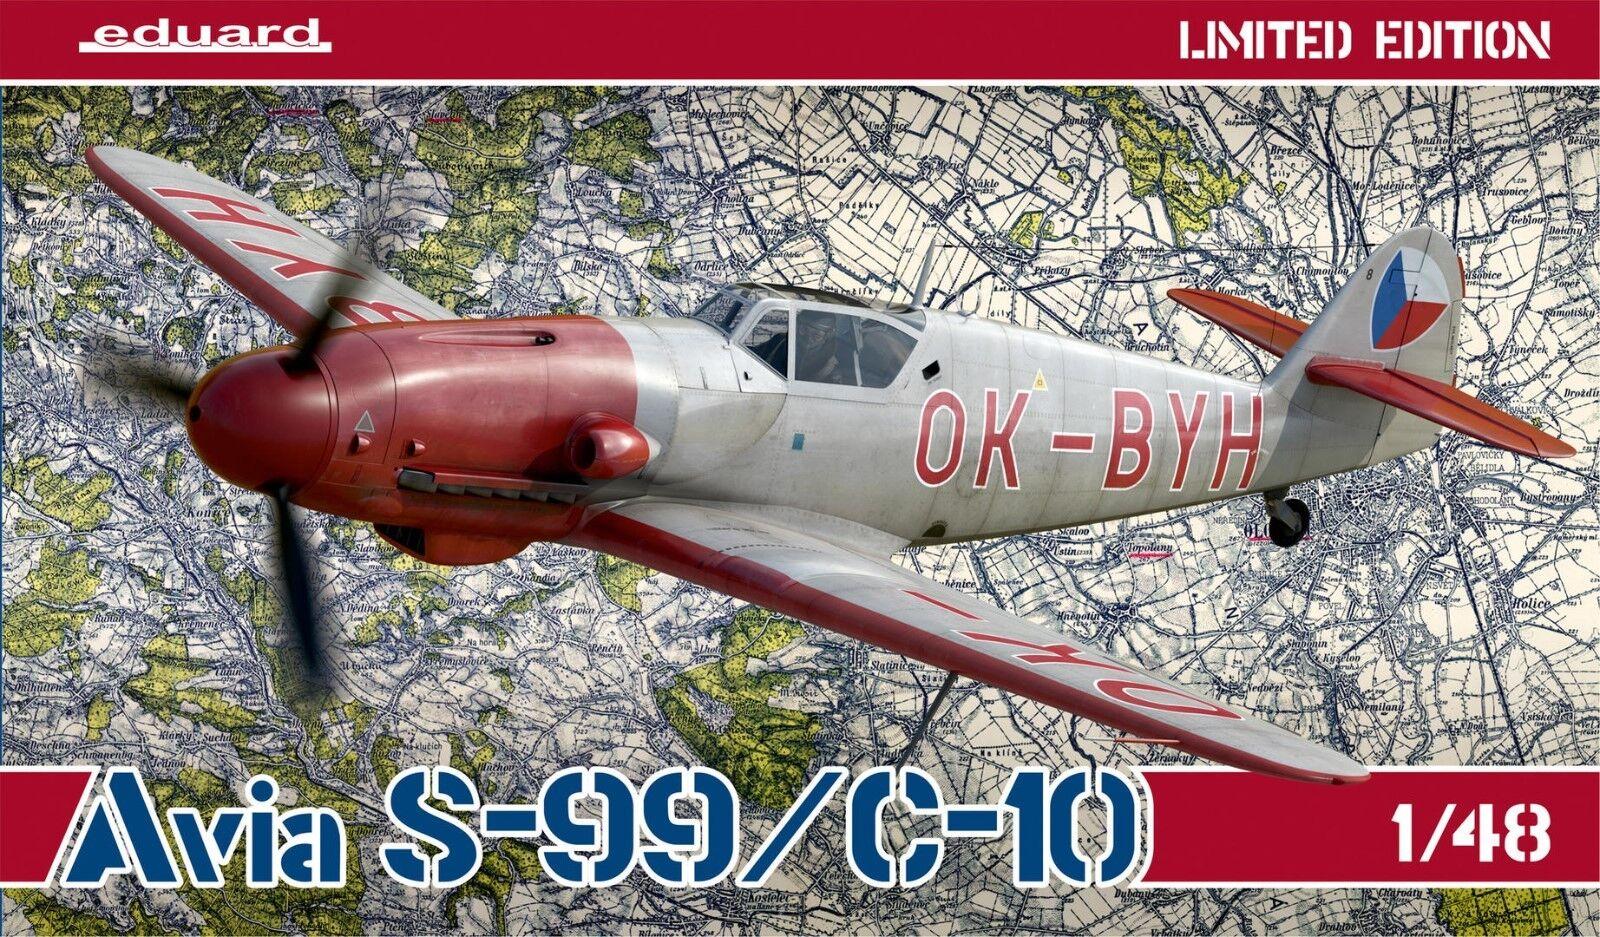 Eduard 11122 1 48th scale Limited Edition Czechoslovak Avia S-99   C-10